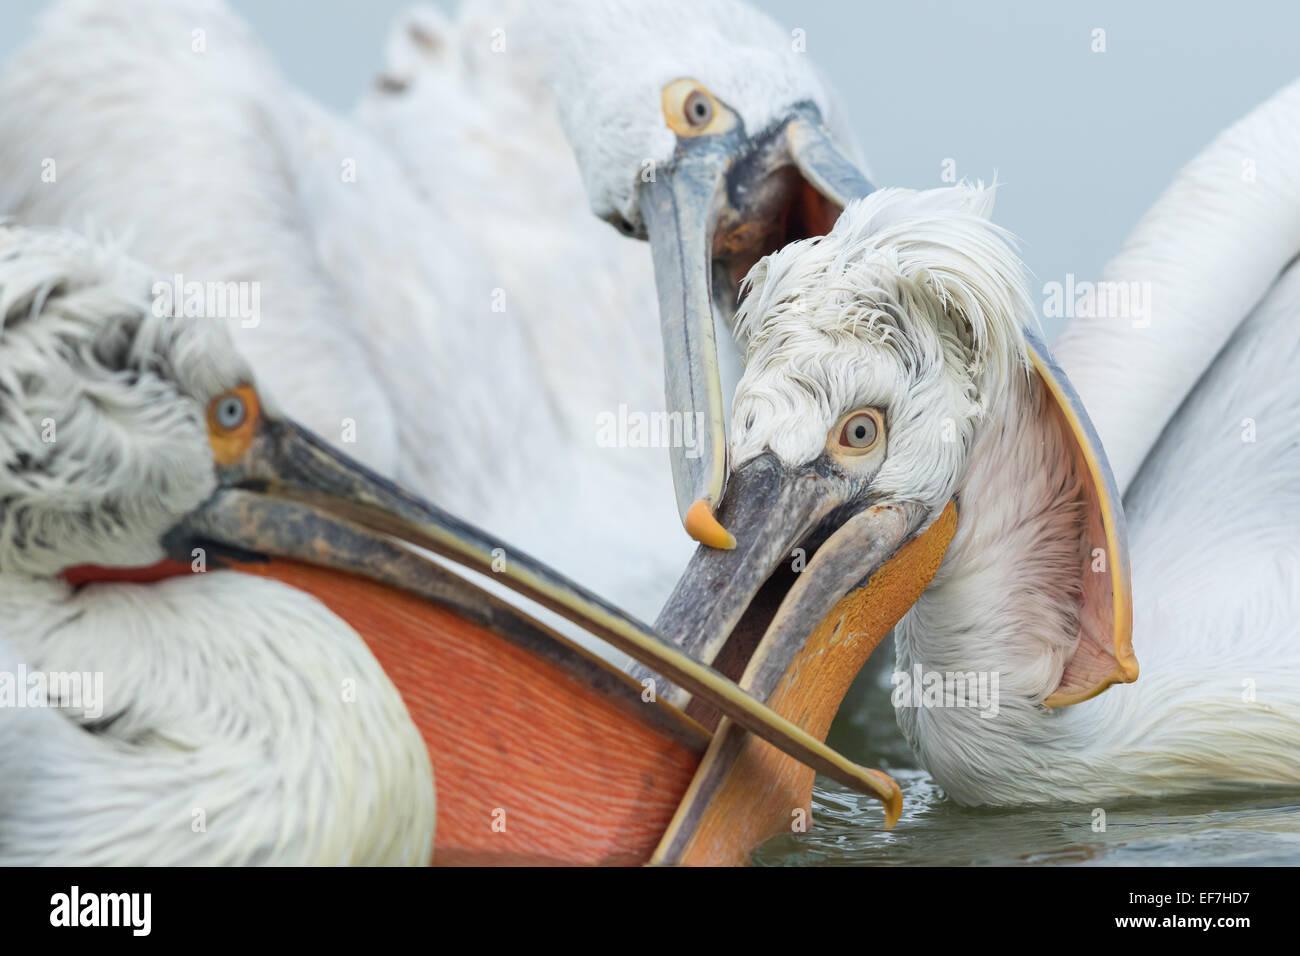 Three Dalmatian Pelicans (Pelecanus crispus) battle for a fish on Lake Kerkini in Northern Greece - Stock Image